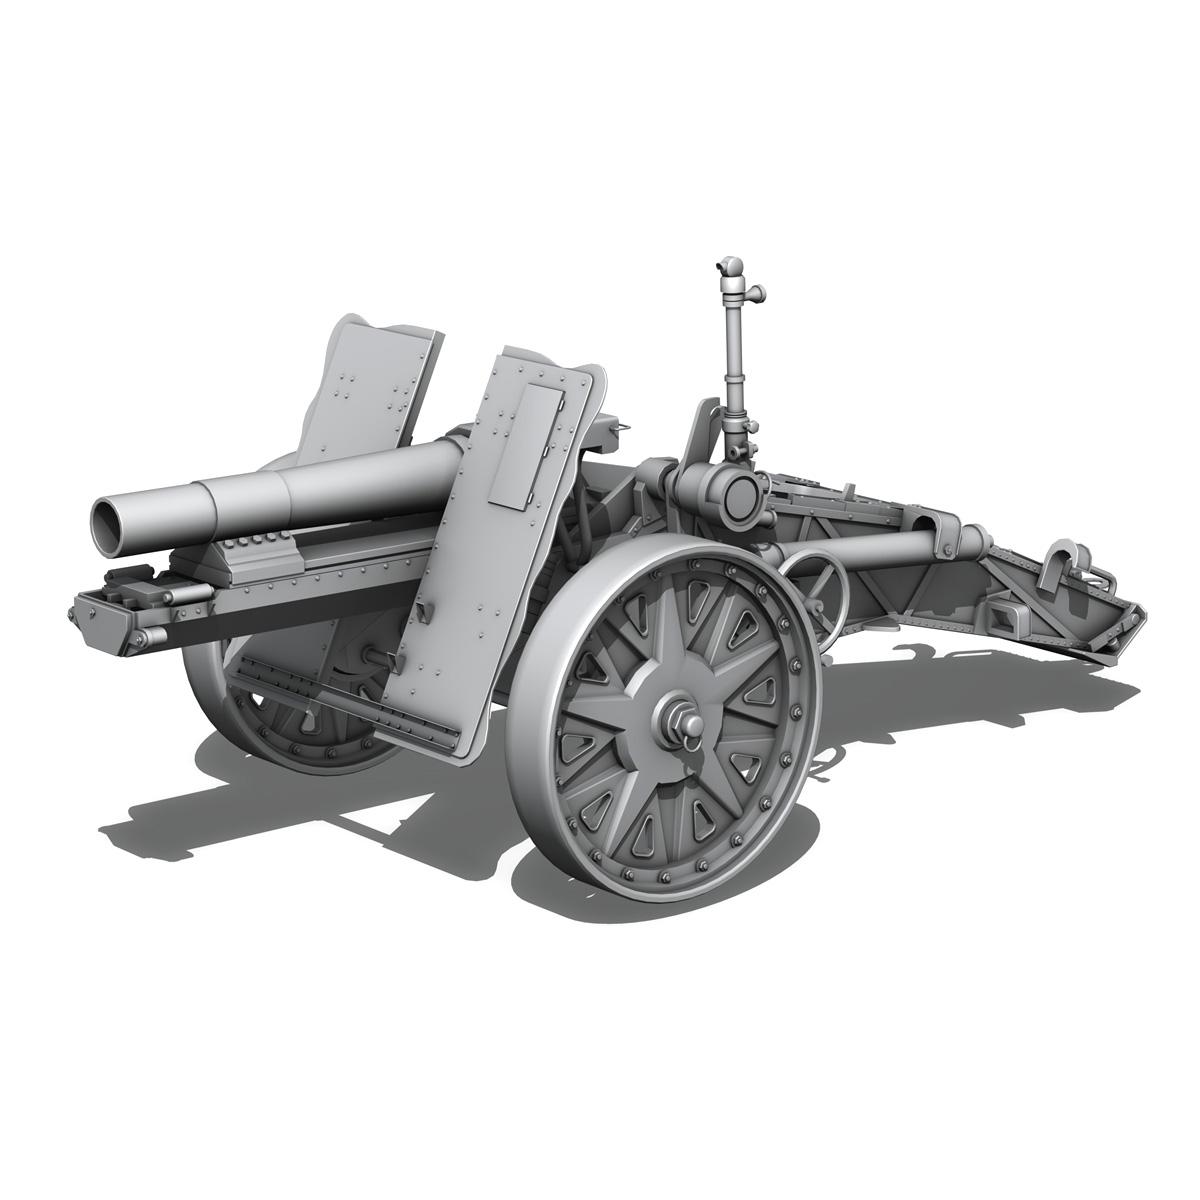 sd.kfz 101 – sturmpanzer 1 – bison 3d model 3ds fbx c4d lwo obj 189278